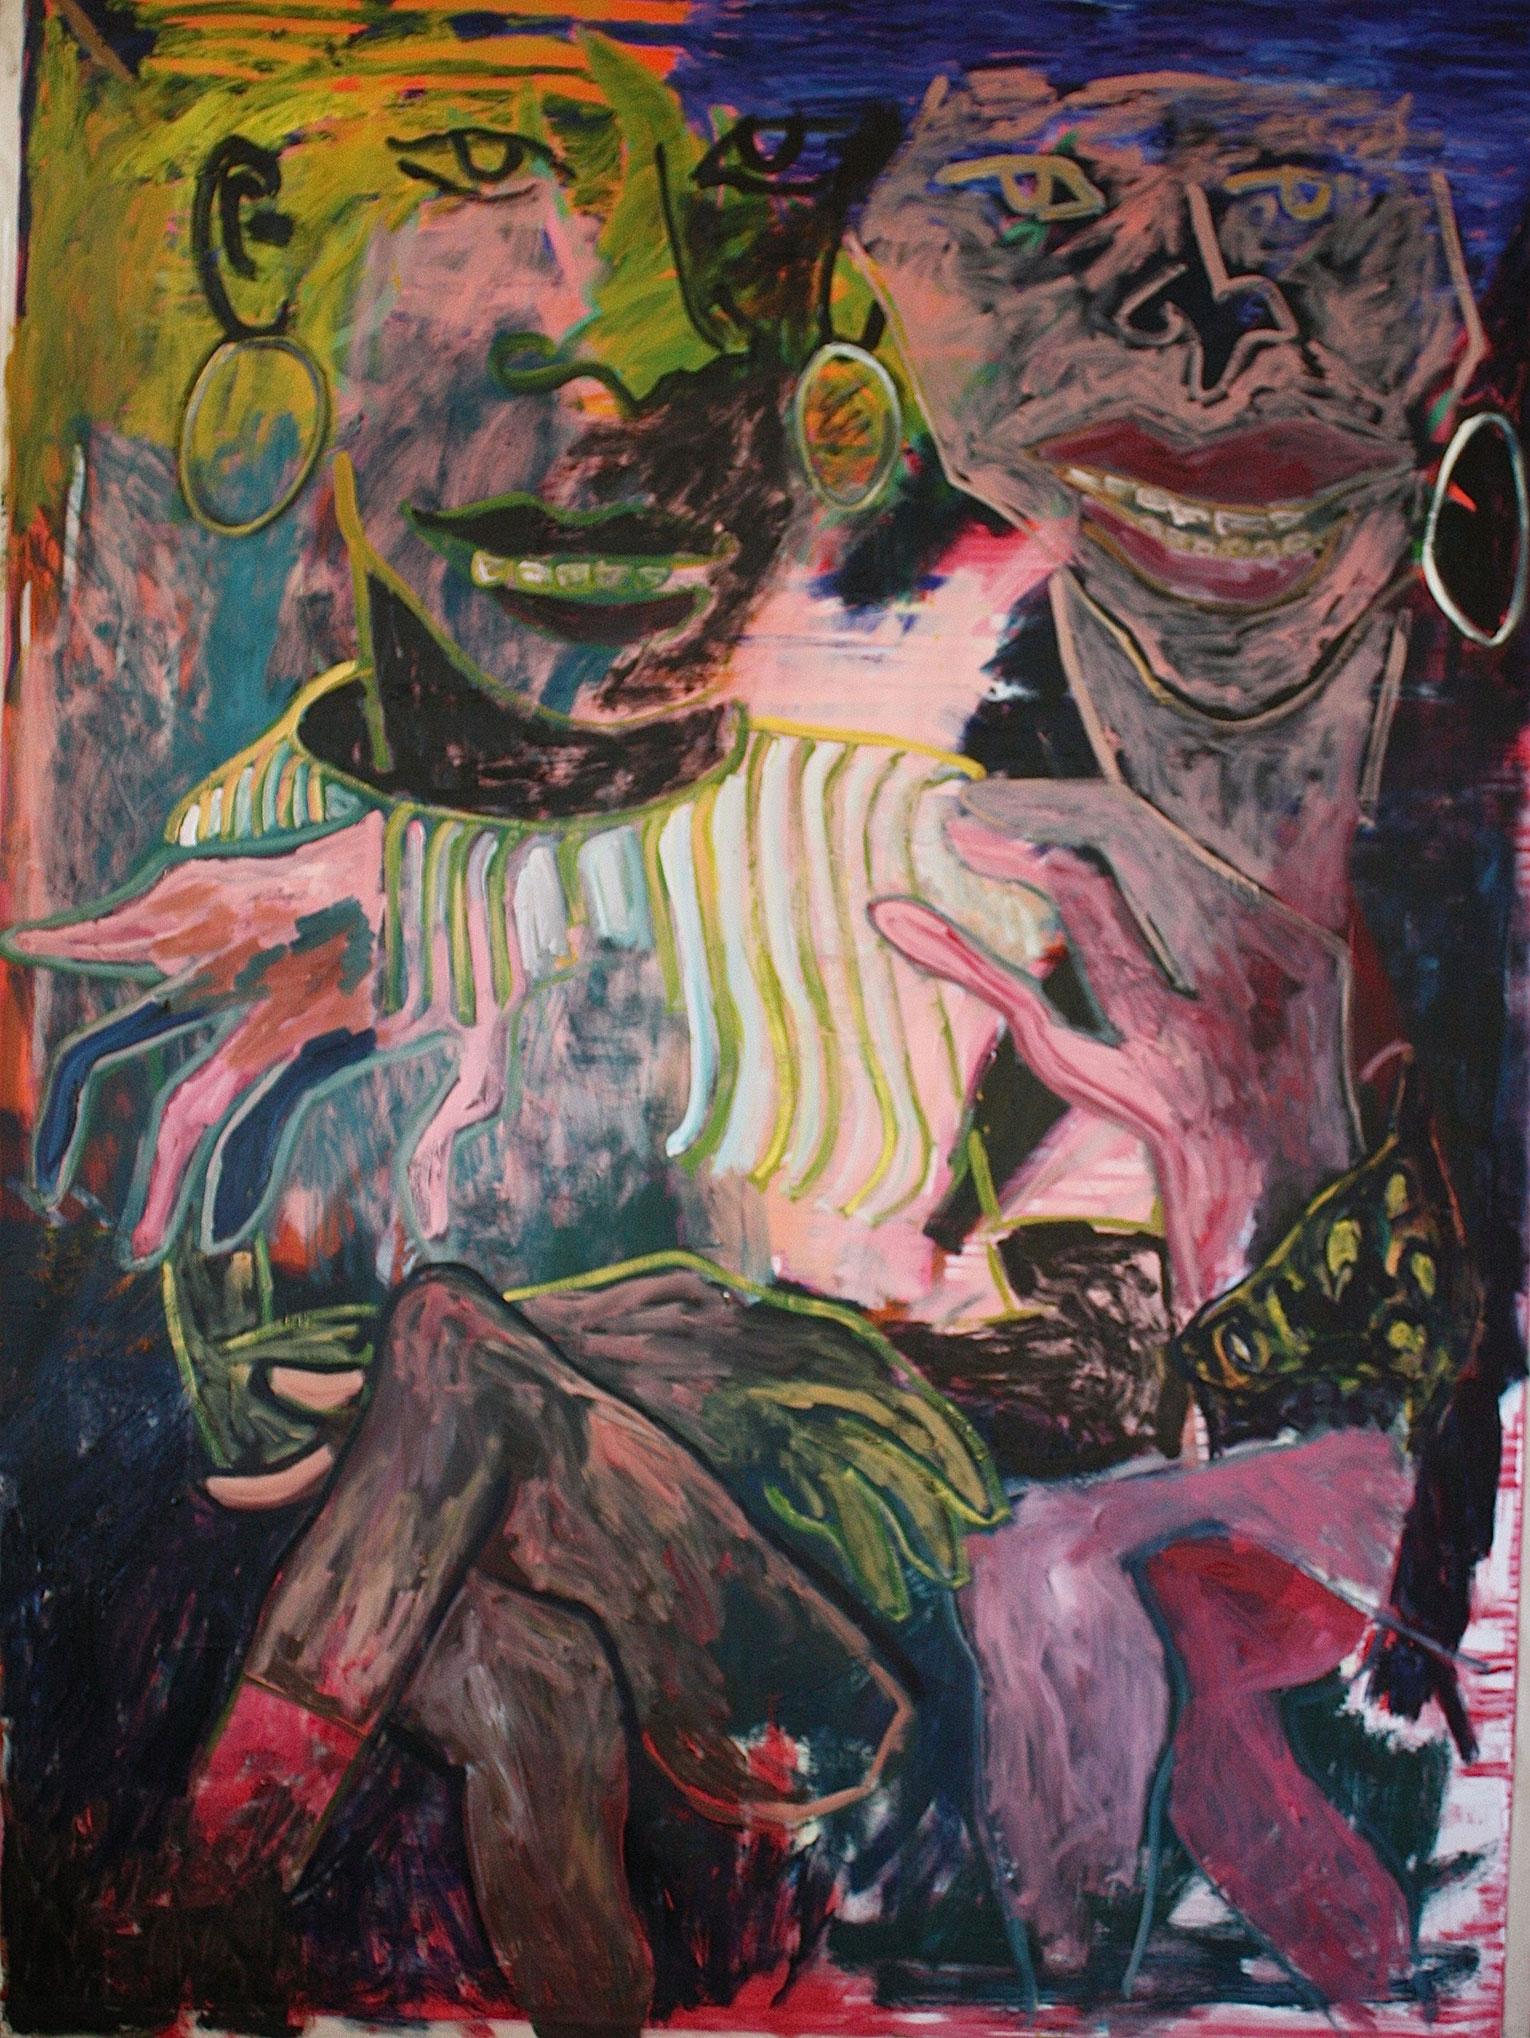 <b>Title:</b>Sisters<br /><b>Year:</b>2016<br /><b>Medium:</b>Oil on canvas<br /><b>Size:</b>182 x 242 cm